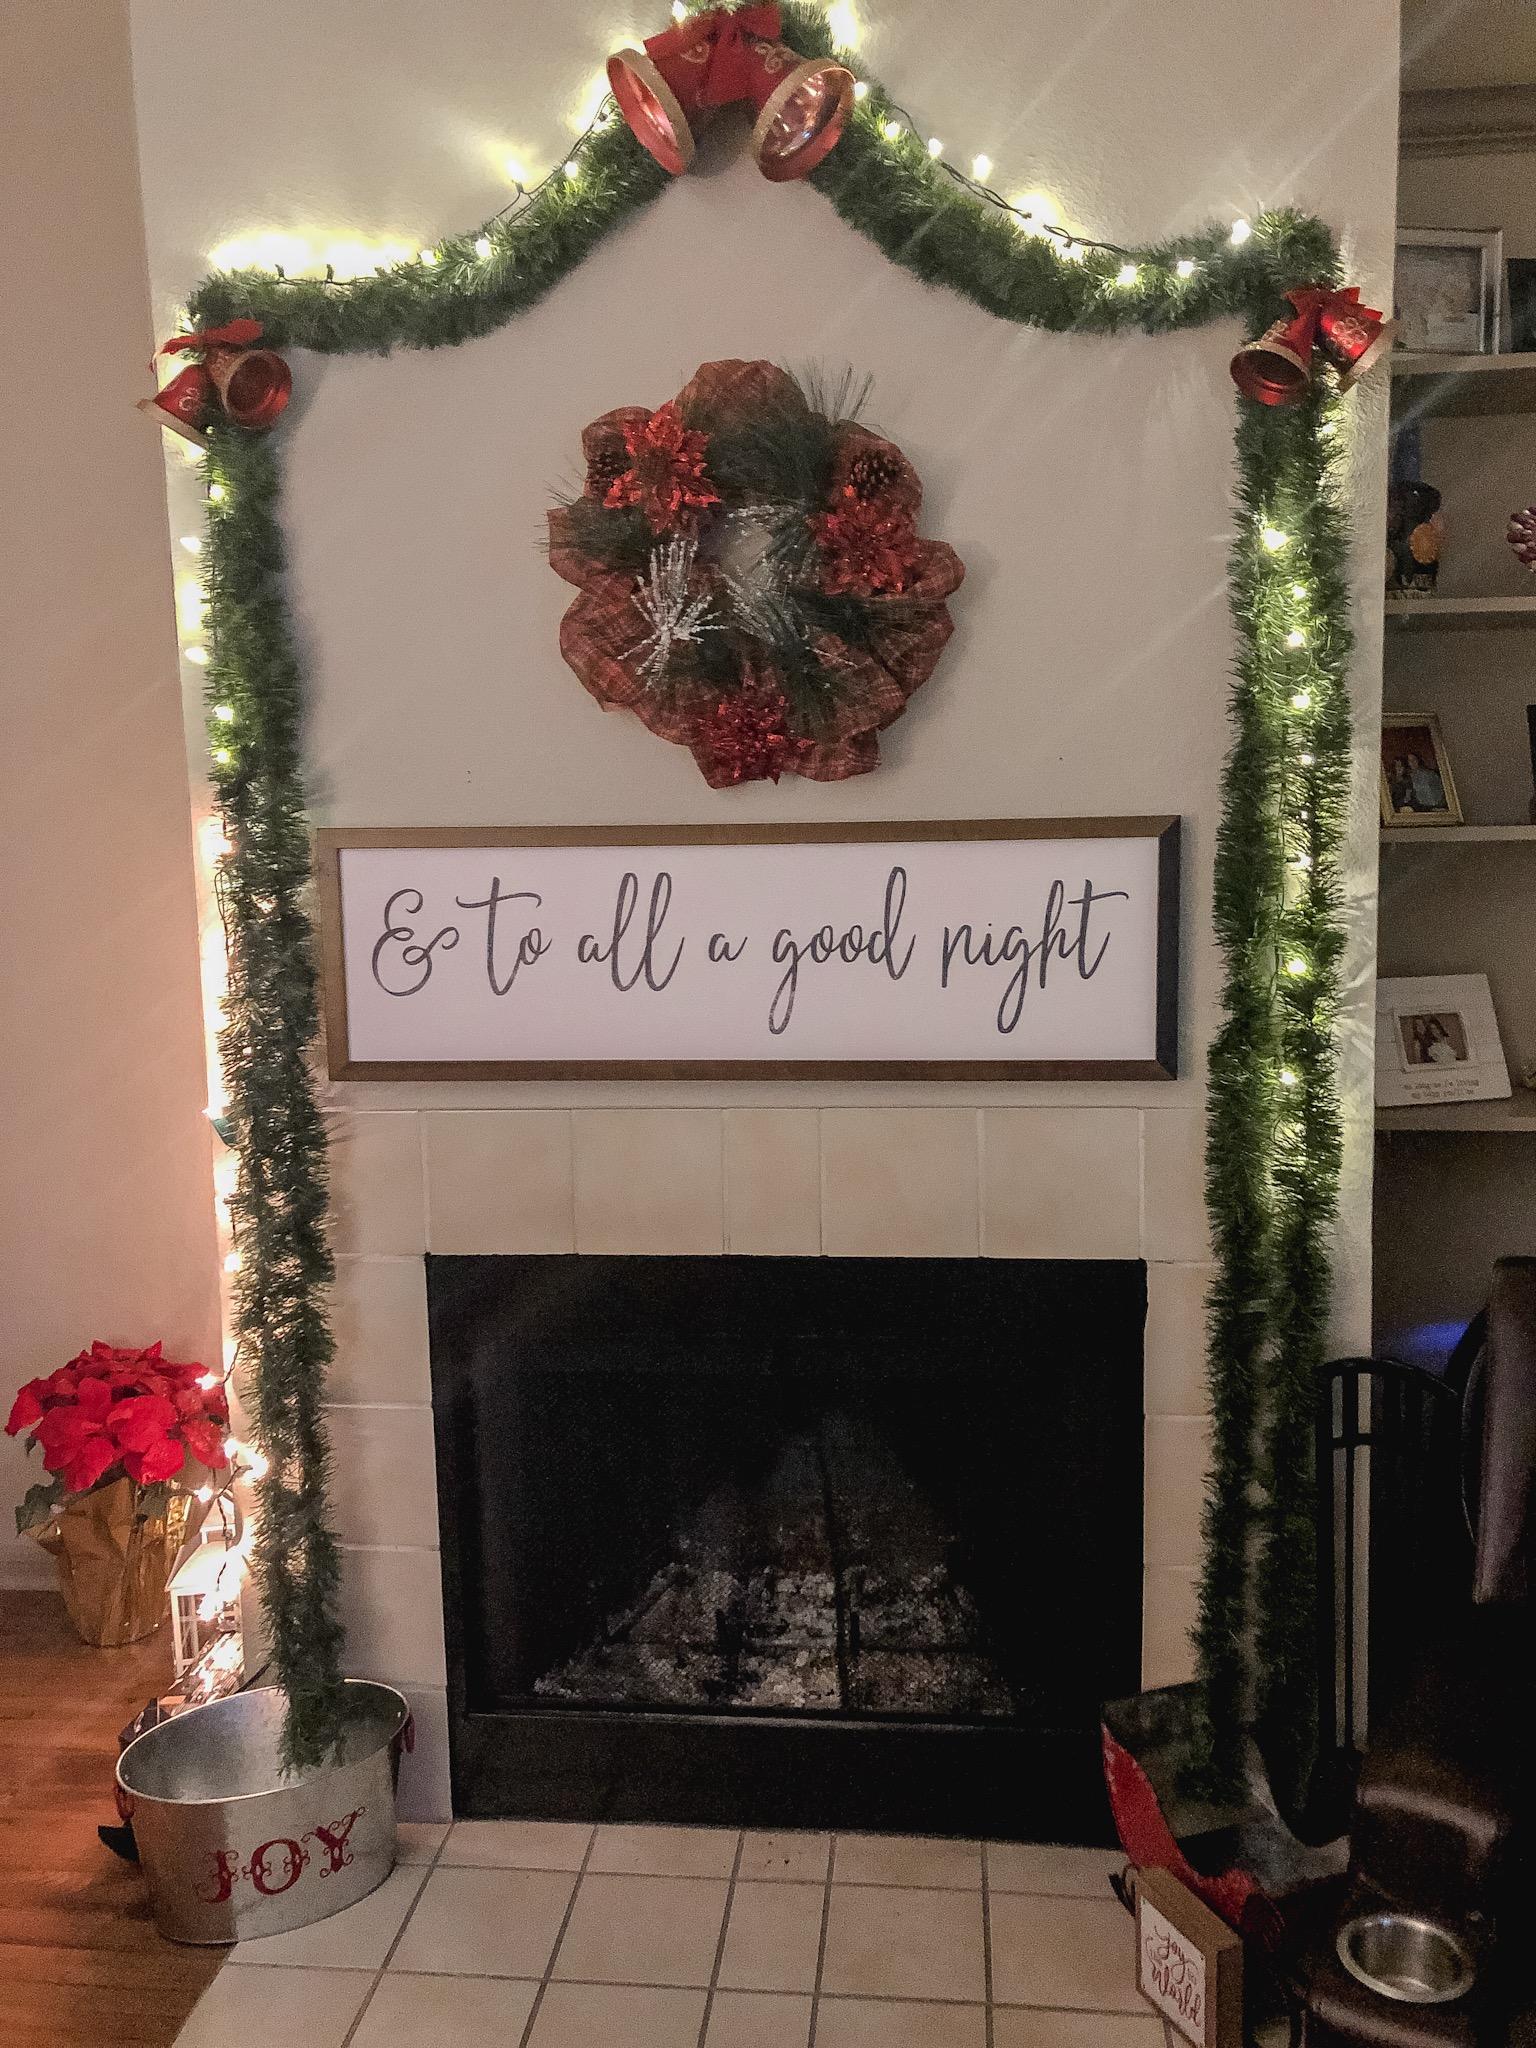 My Home Decor This Holiday Season | Chaos and Coffee